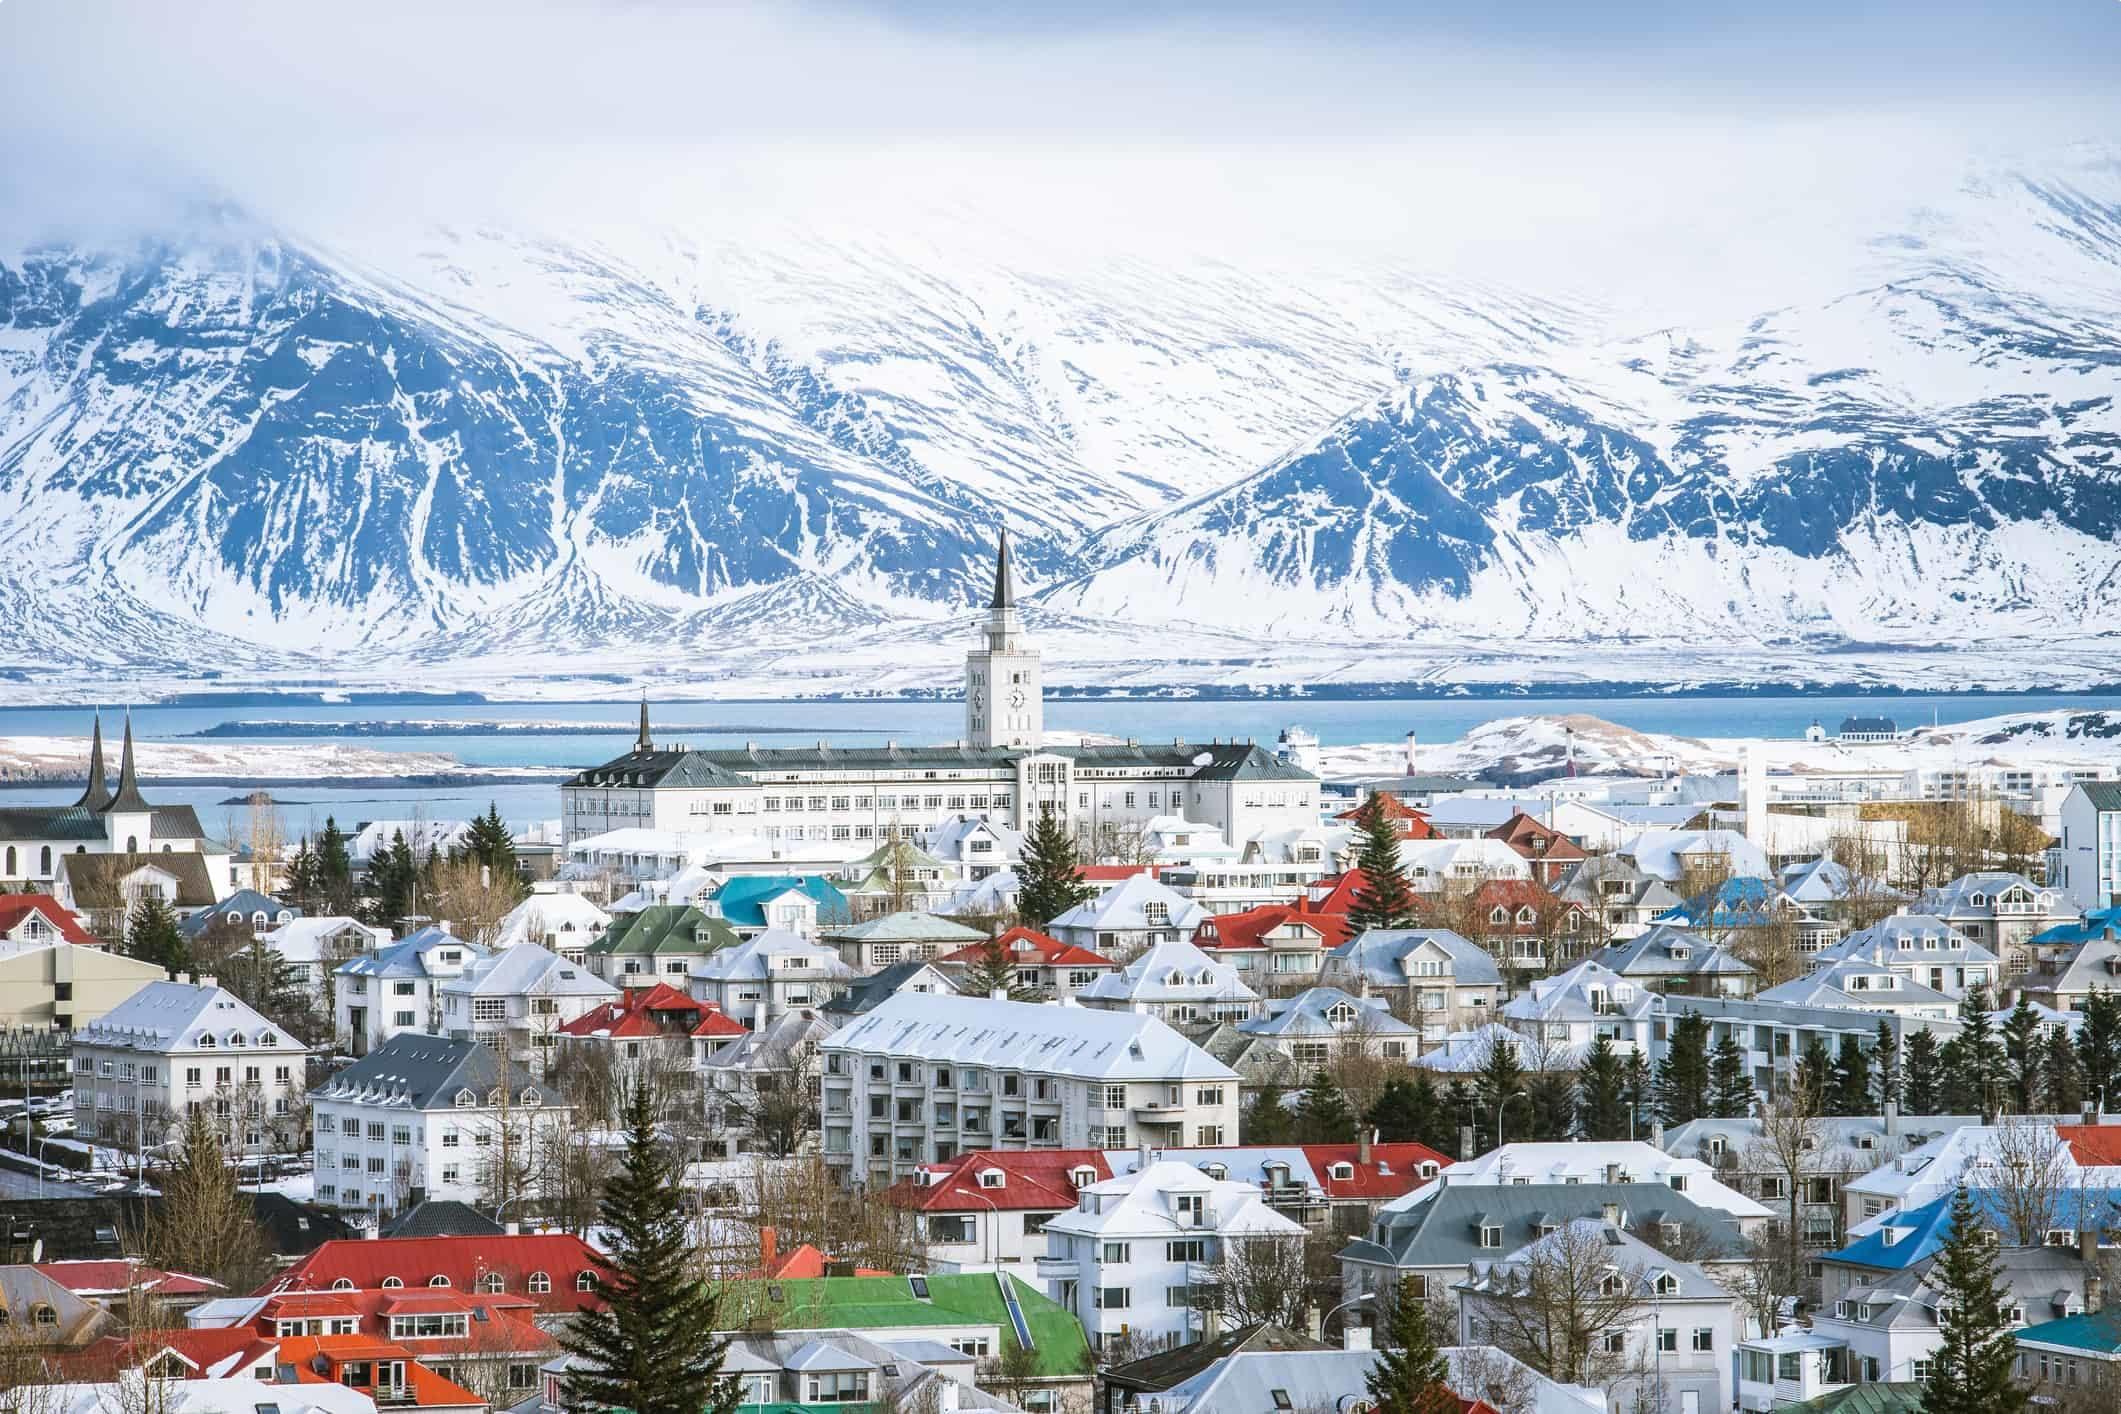 Reykjavik capital city of Iceland